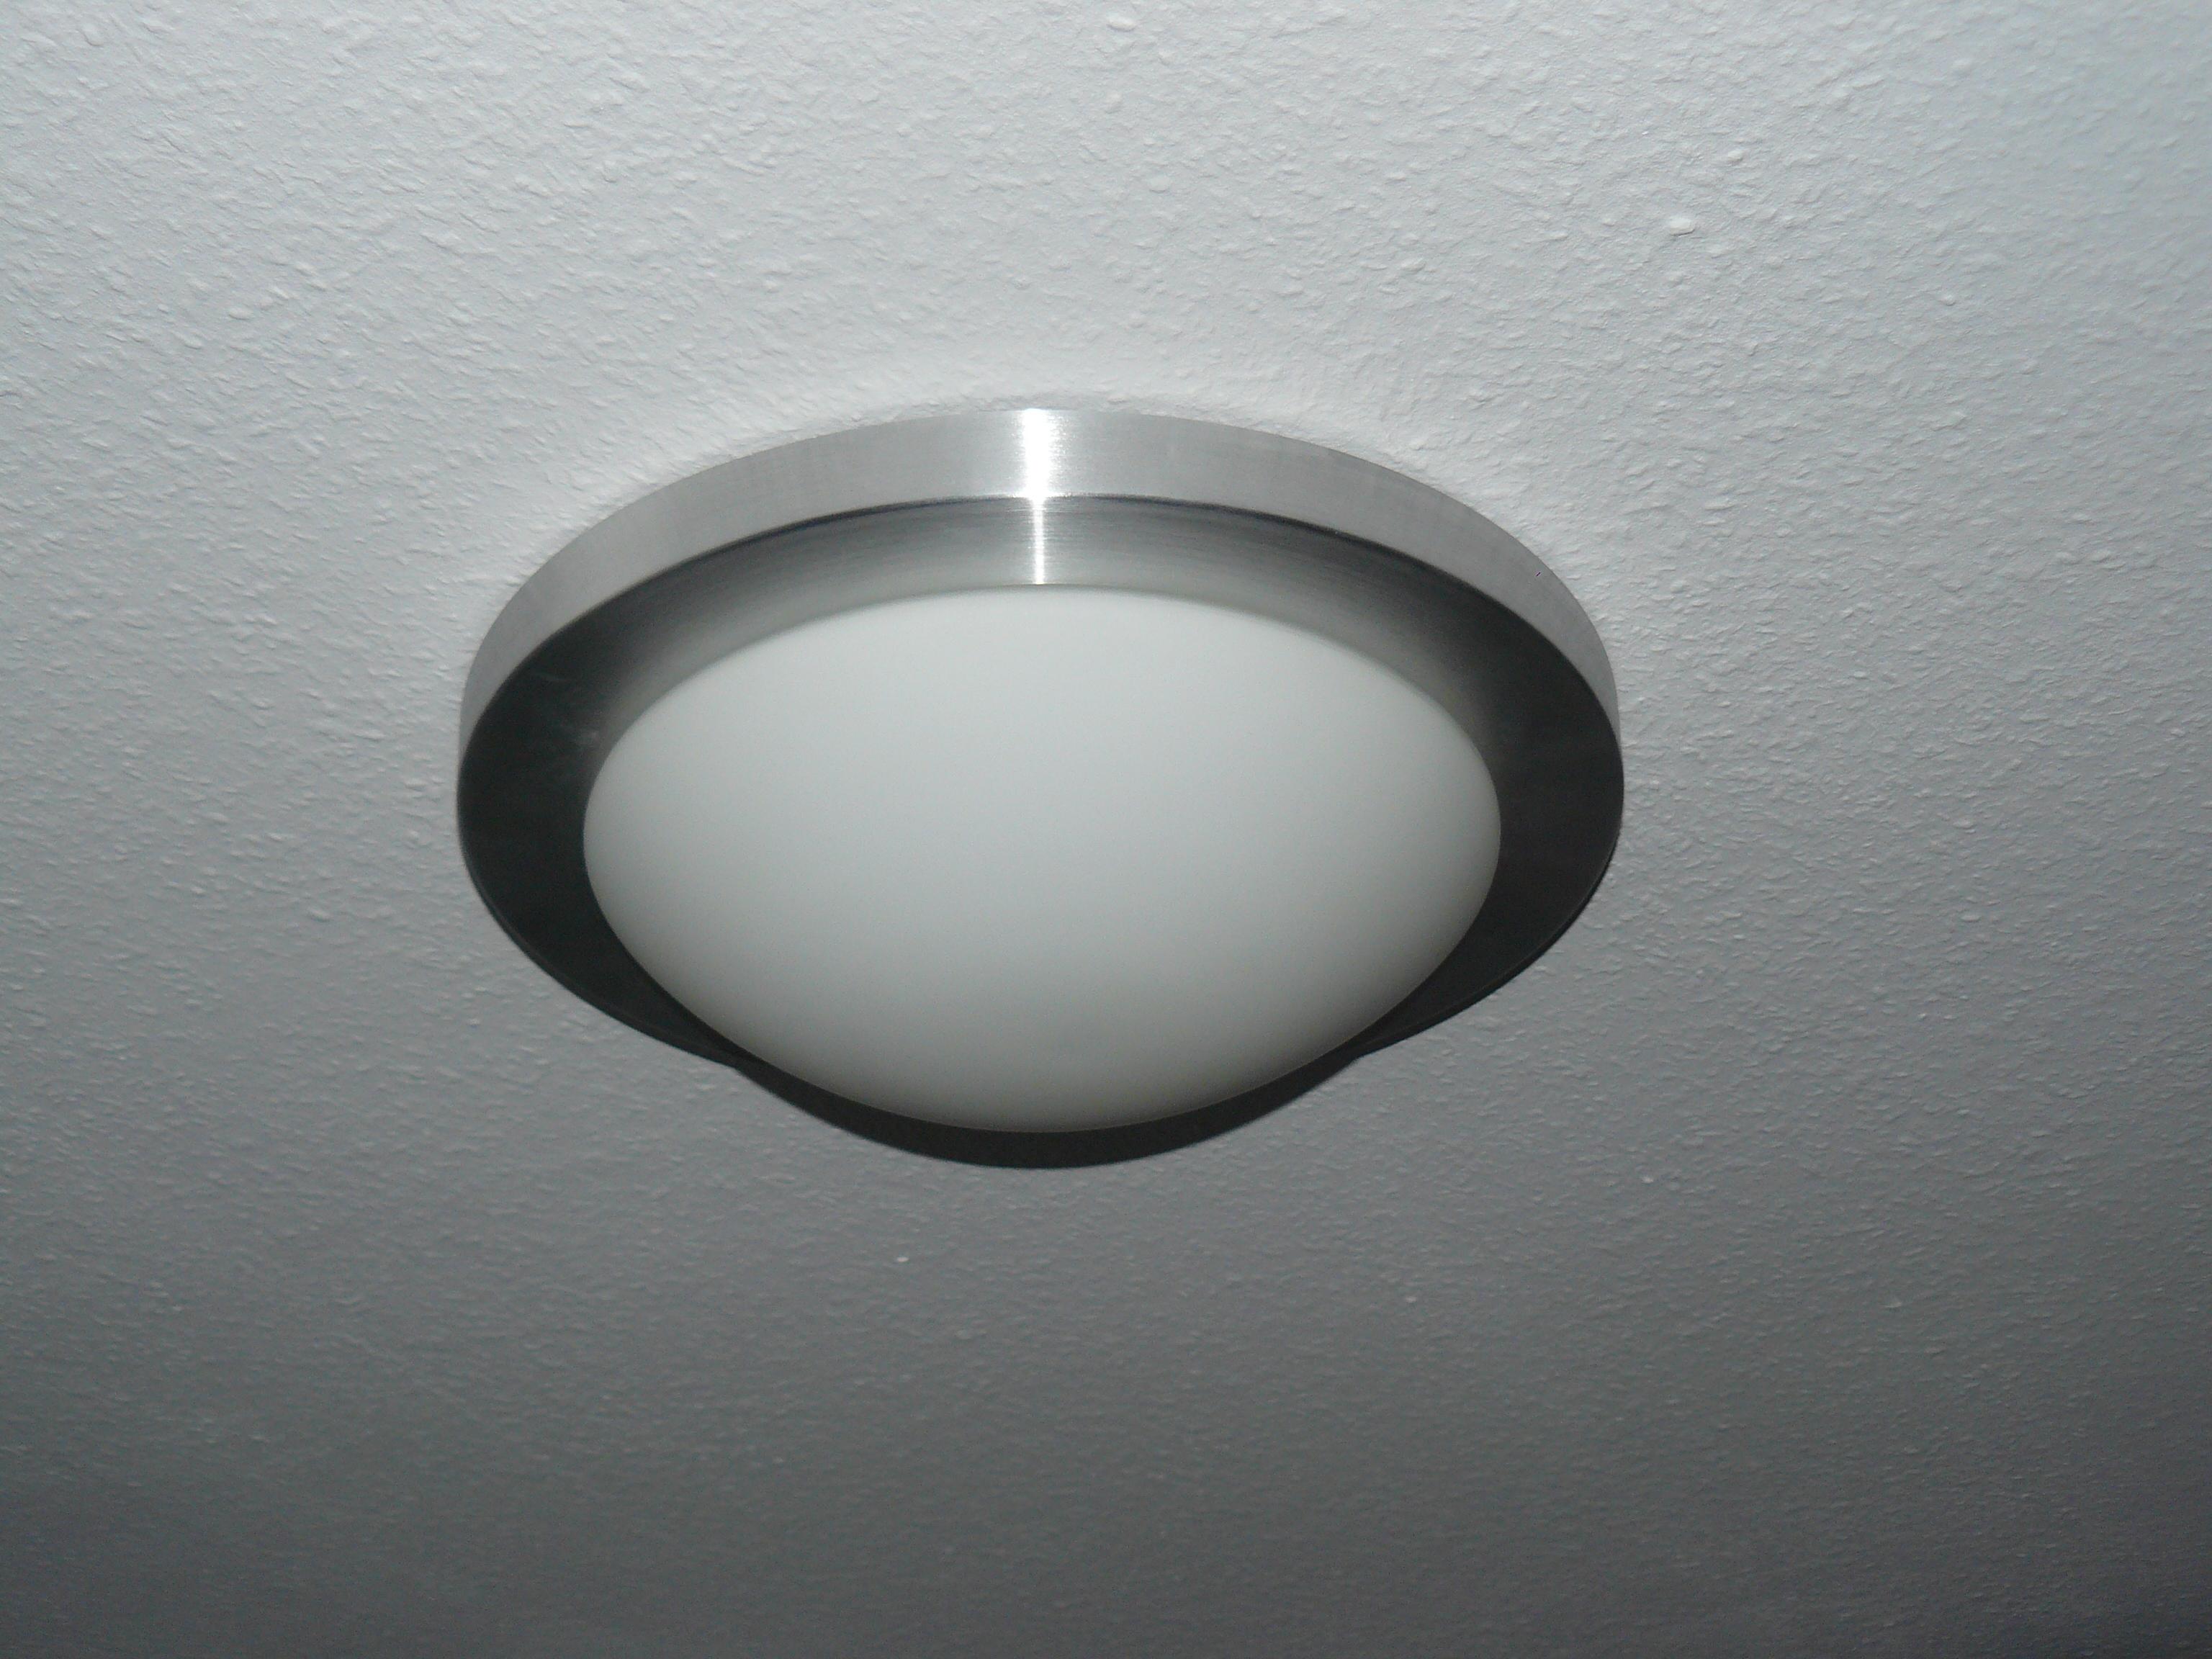 Lampe Abstellraum